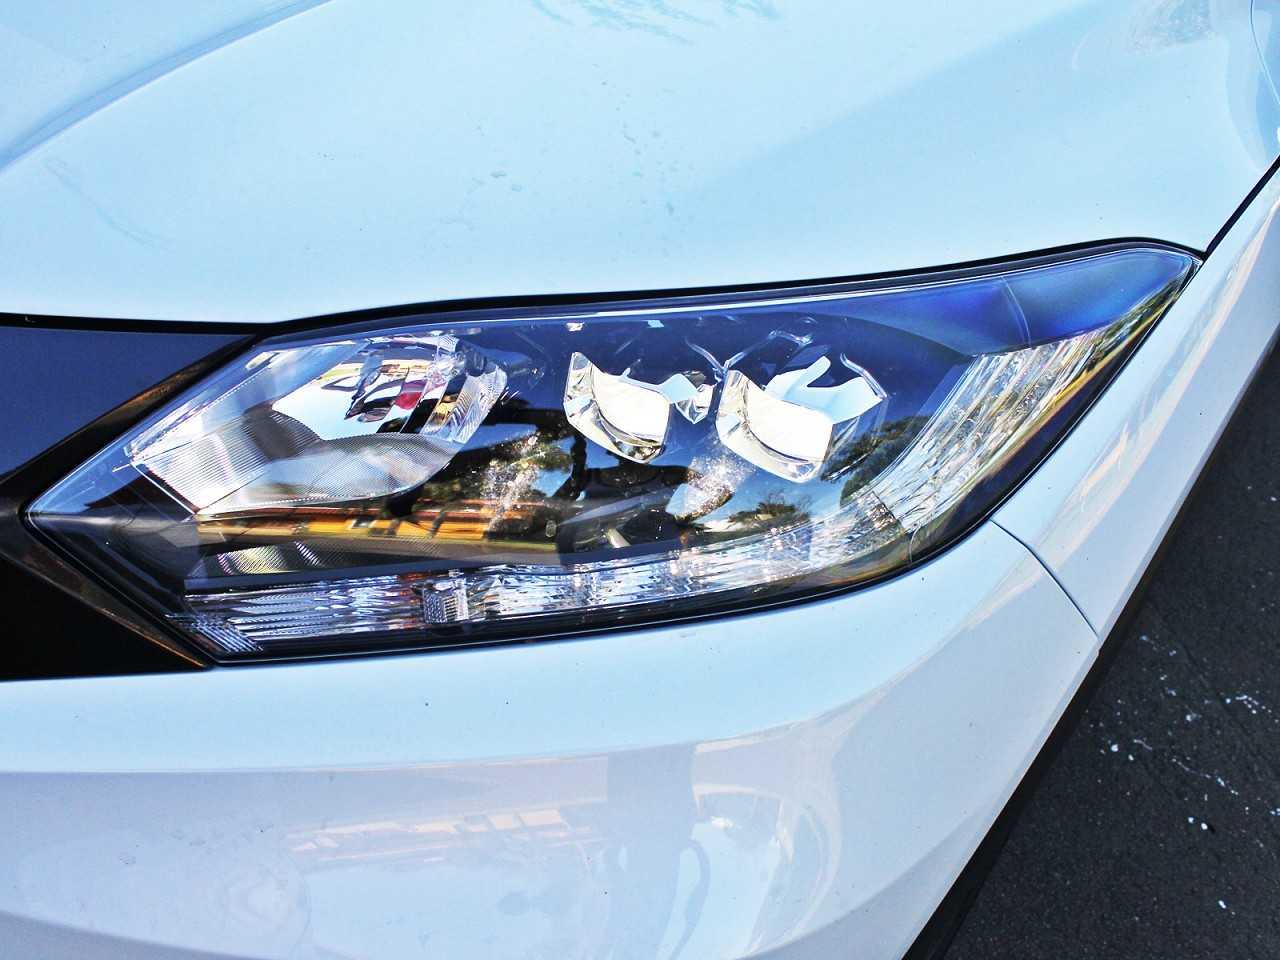 HondaHR-V 2017 - faróis